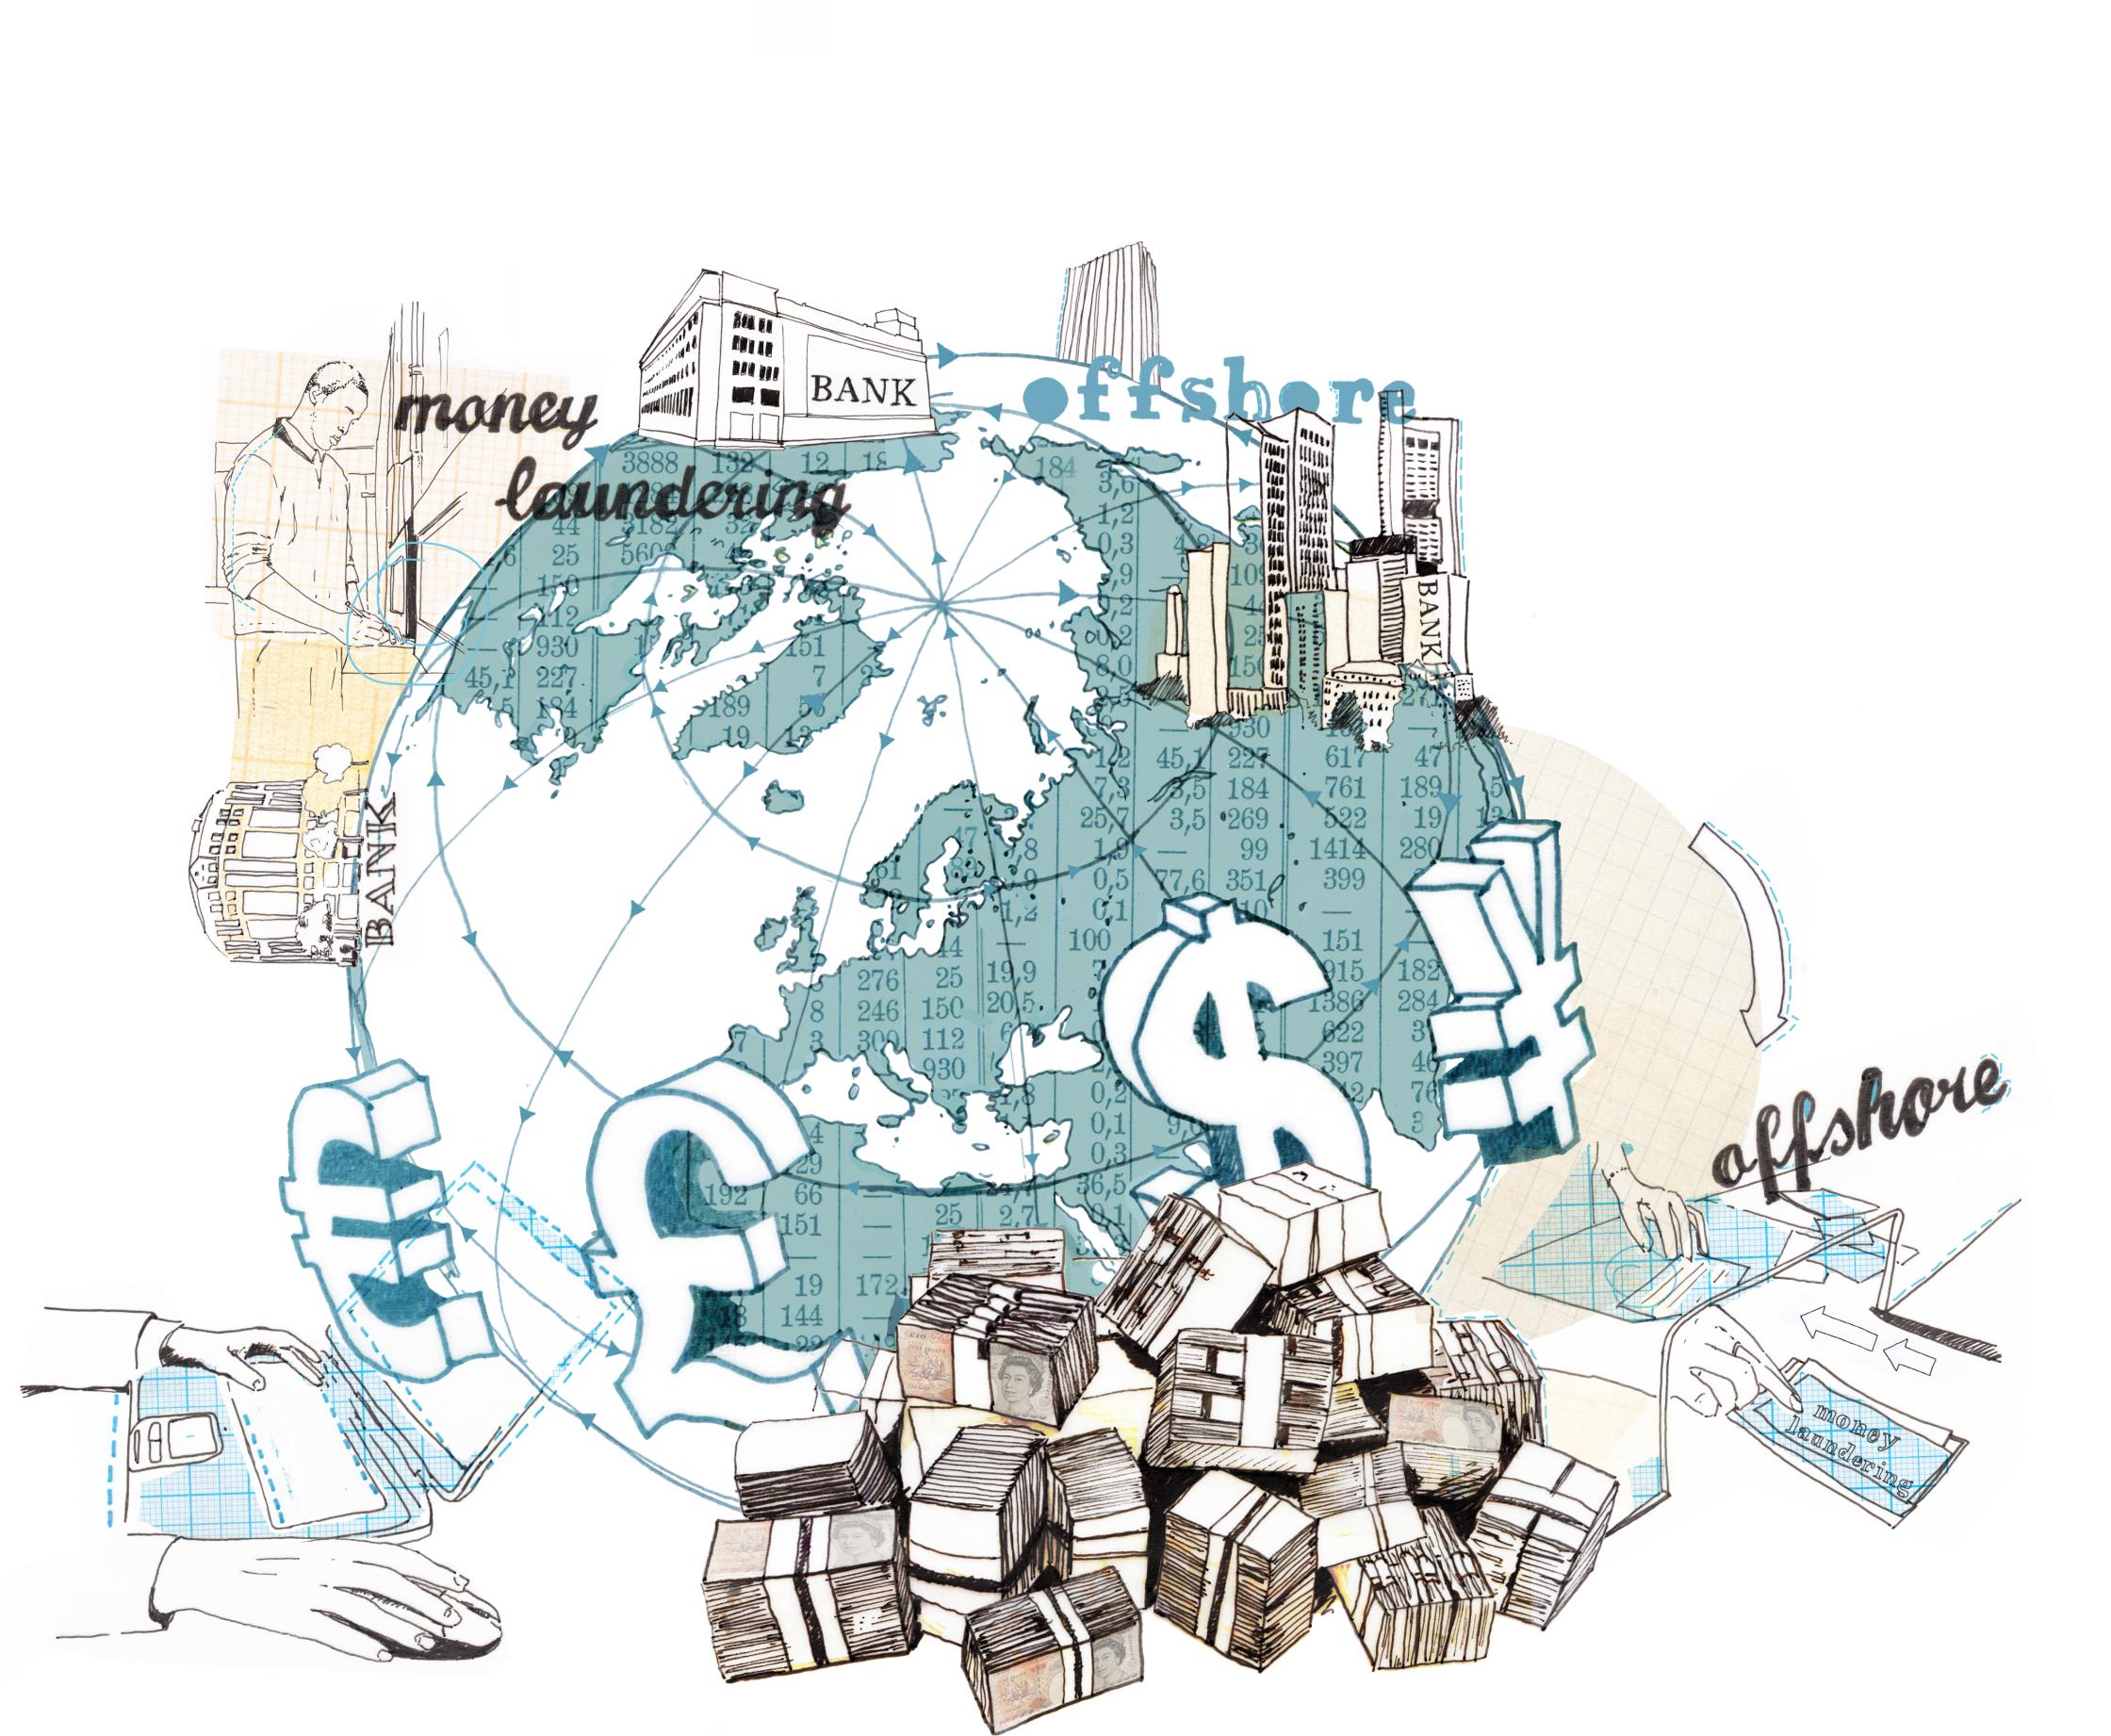 zellmer-tax-offshore-banking-uk-hmrc.jpg